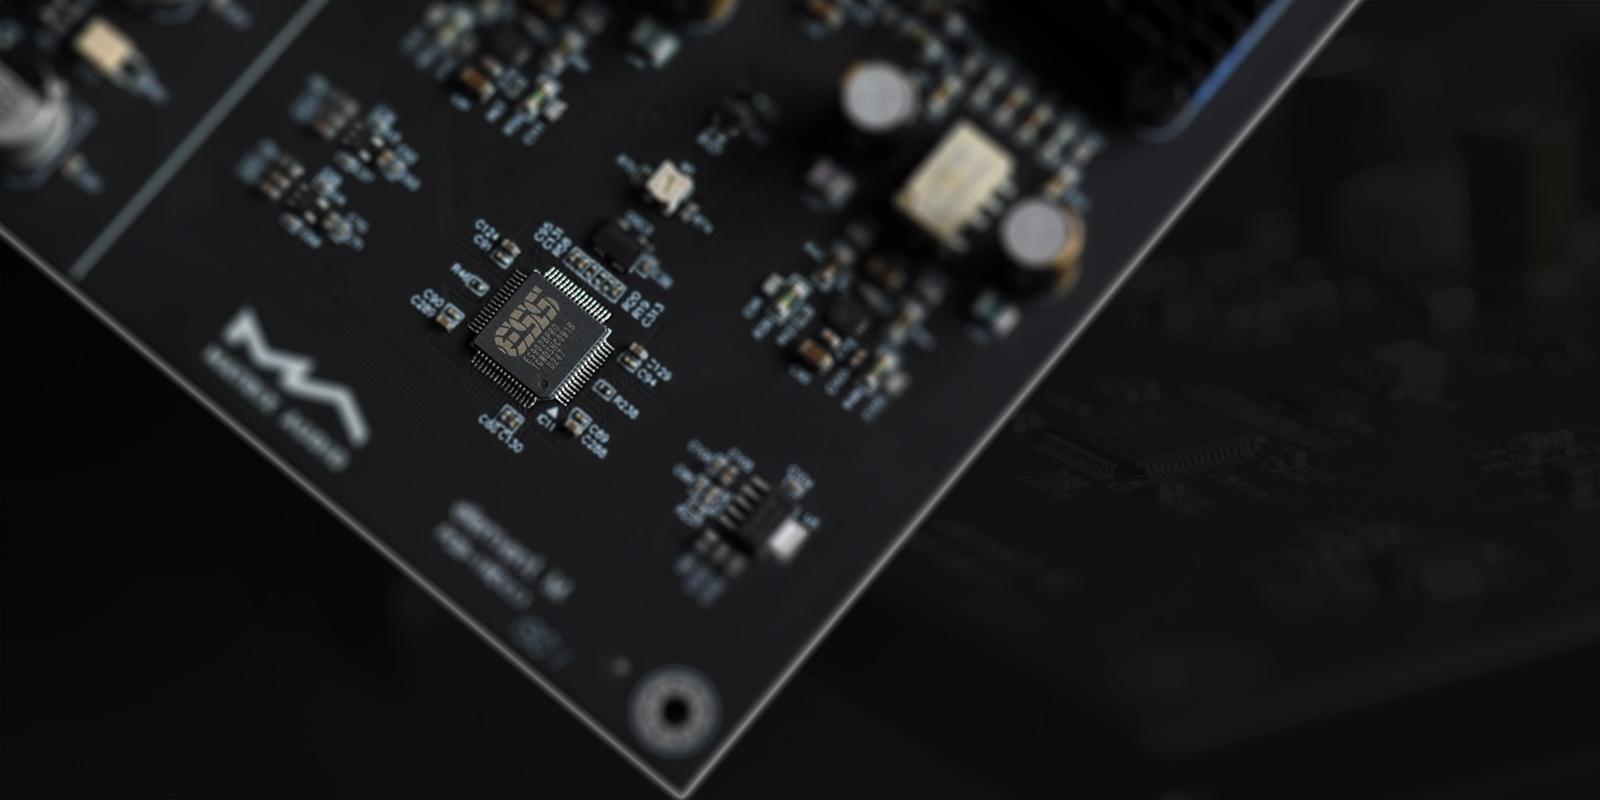 Matrix Audio element M streamer circuit board